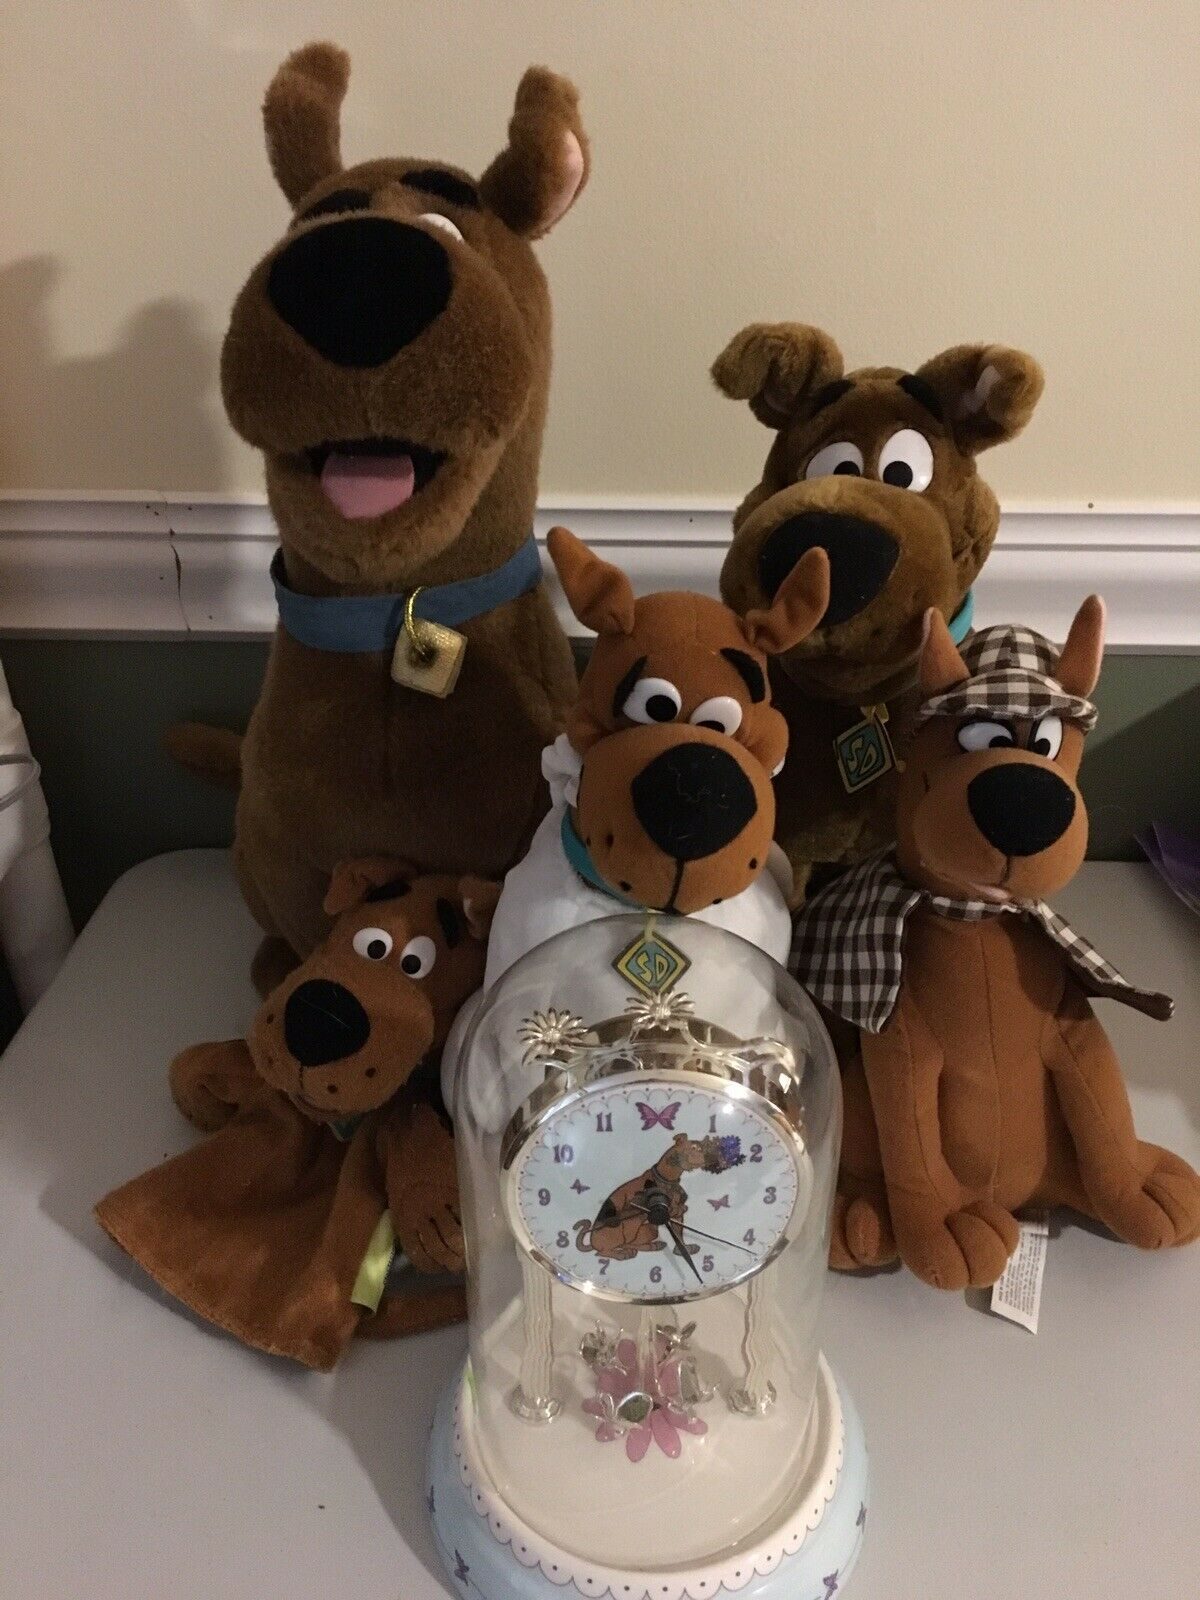 Scooby Doo Lot  Of Plush Animals, Clock, Dollt Lot Of 6